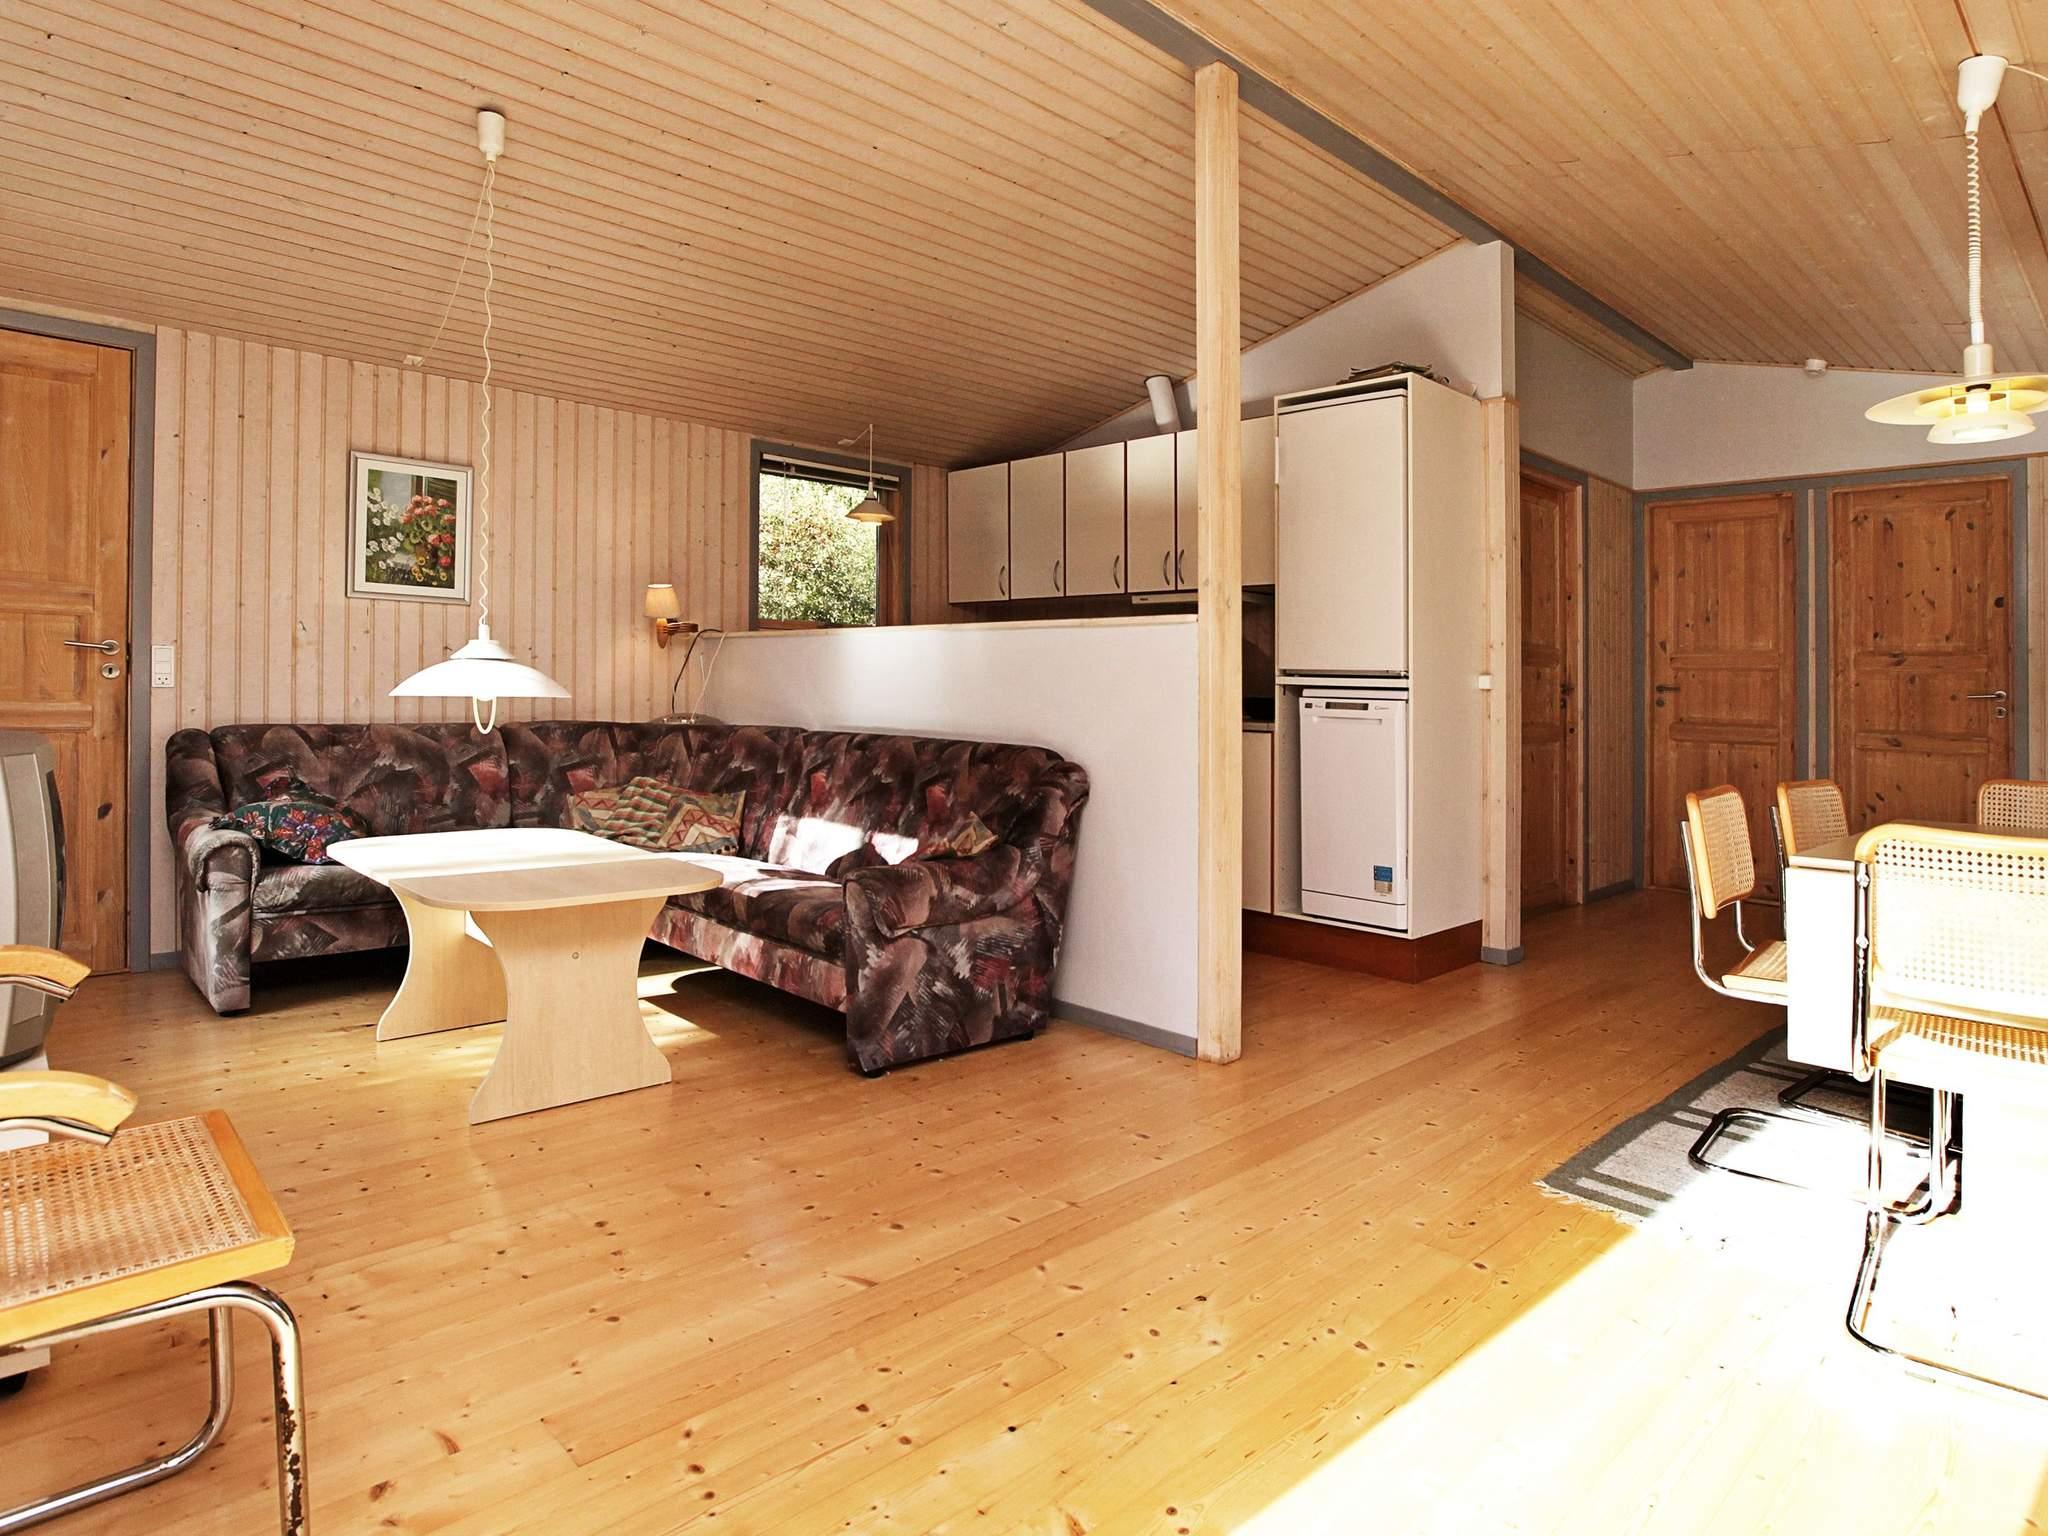 Ferienhaus Overby Lyng (93506), Nykøbing Sj, , Westseeland, Dänemark, Bild 7